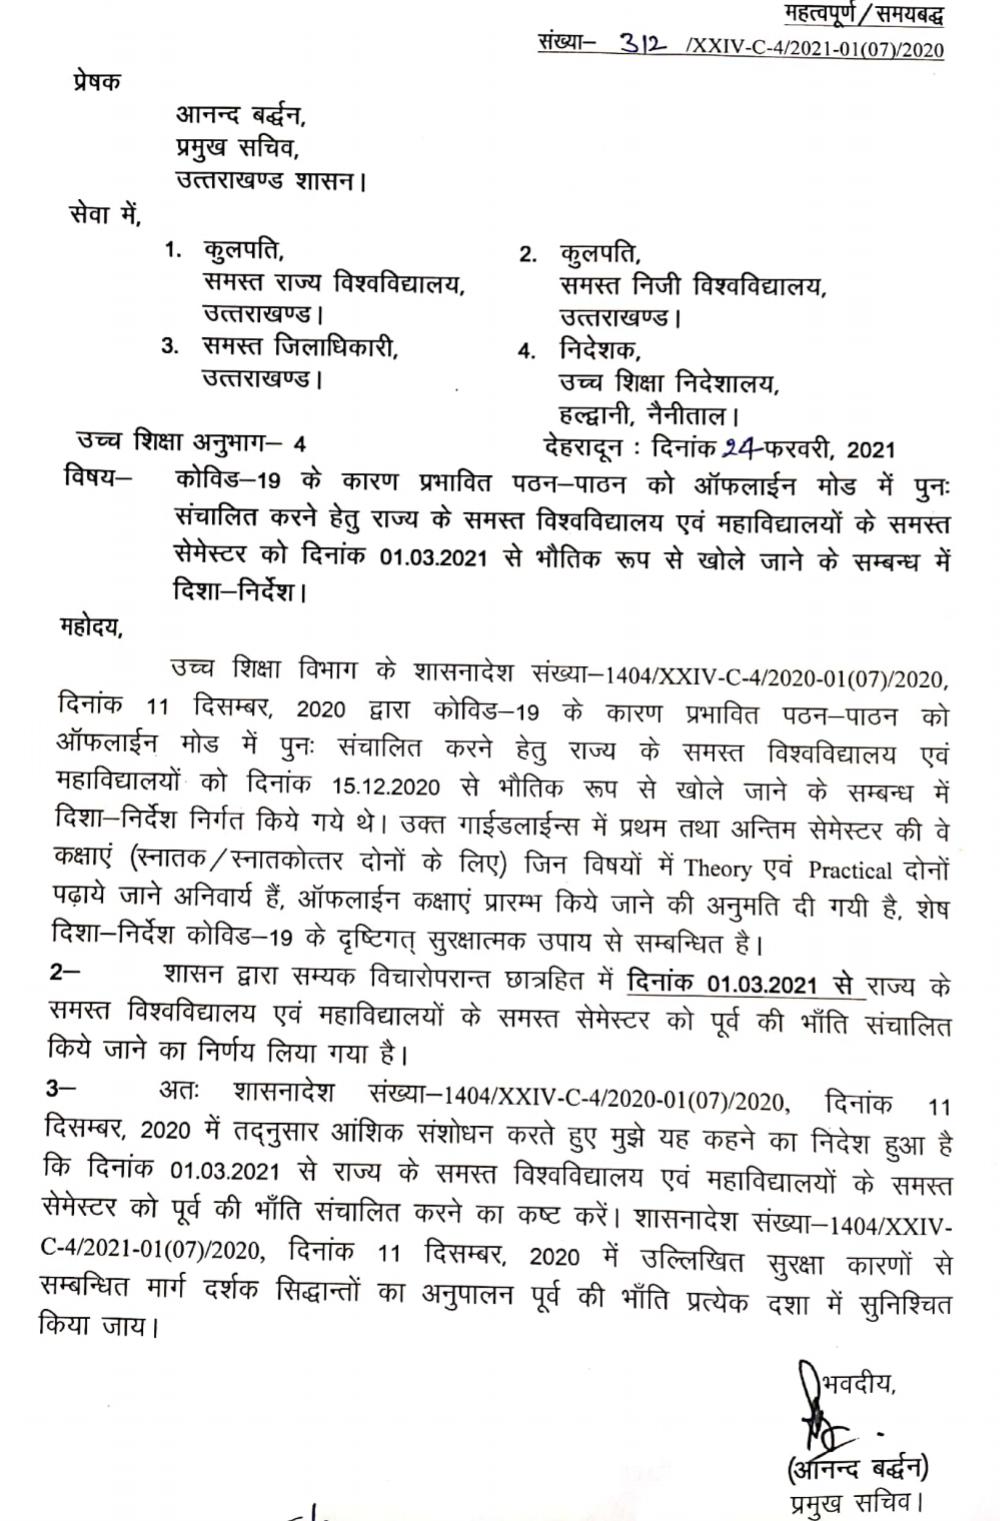 Uttarakhand college opening date